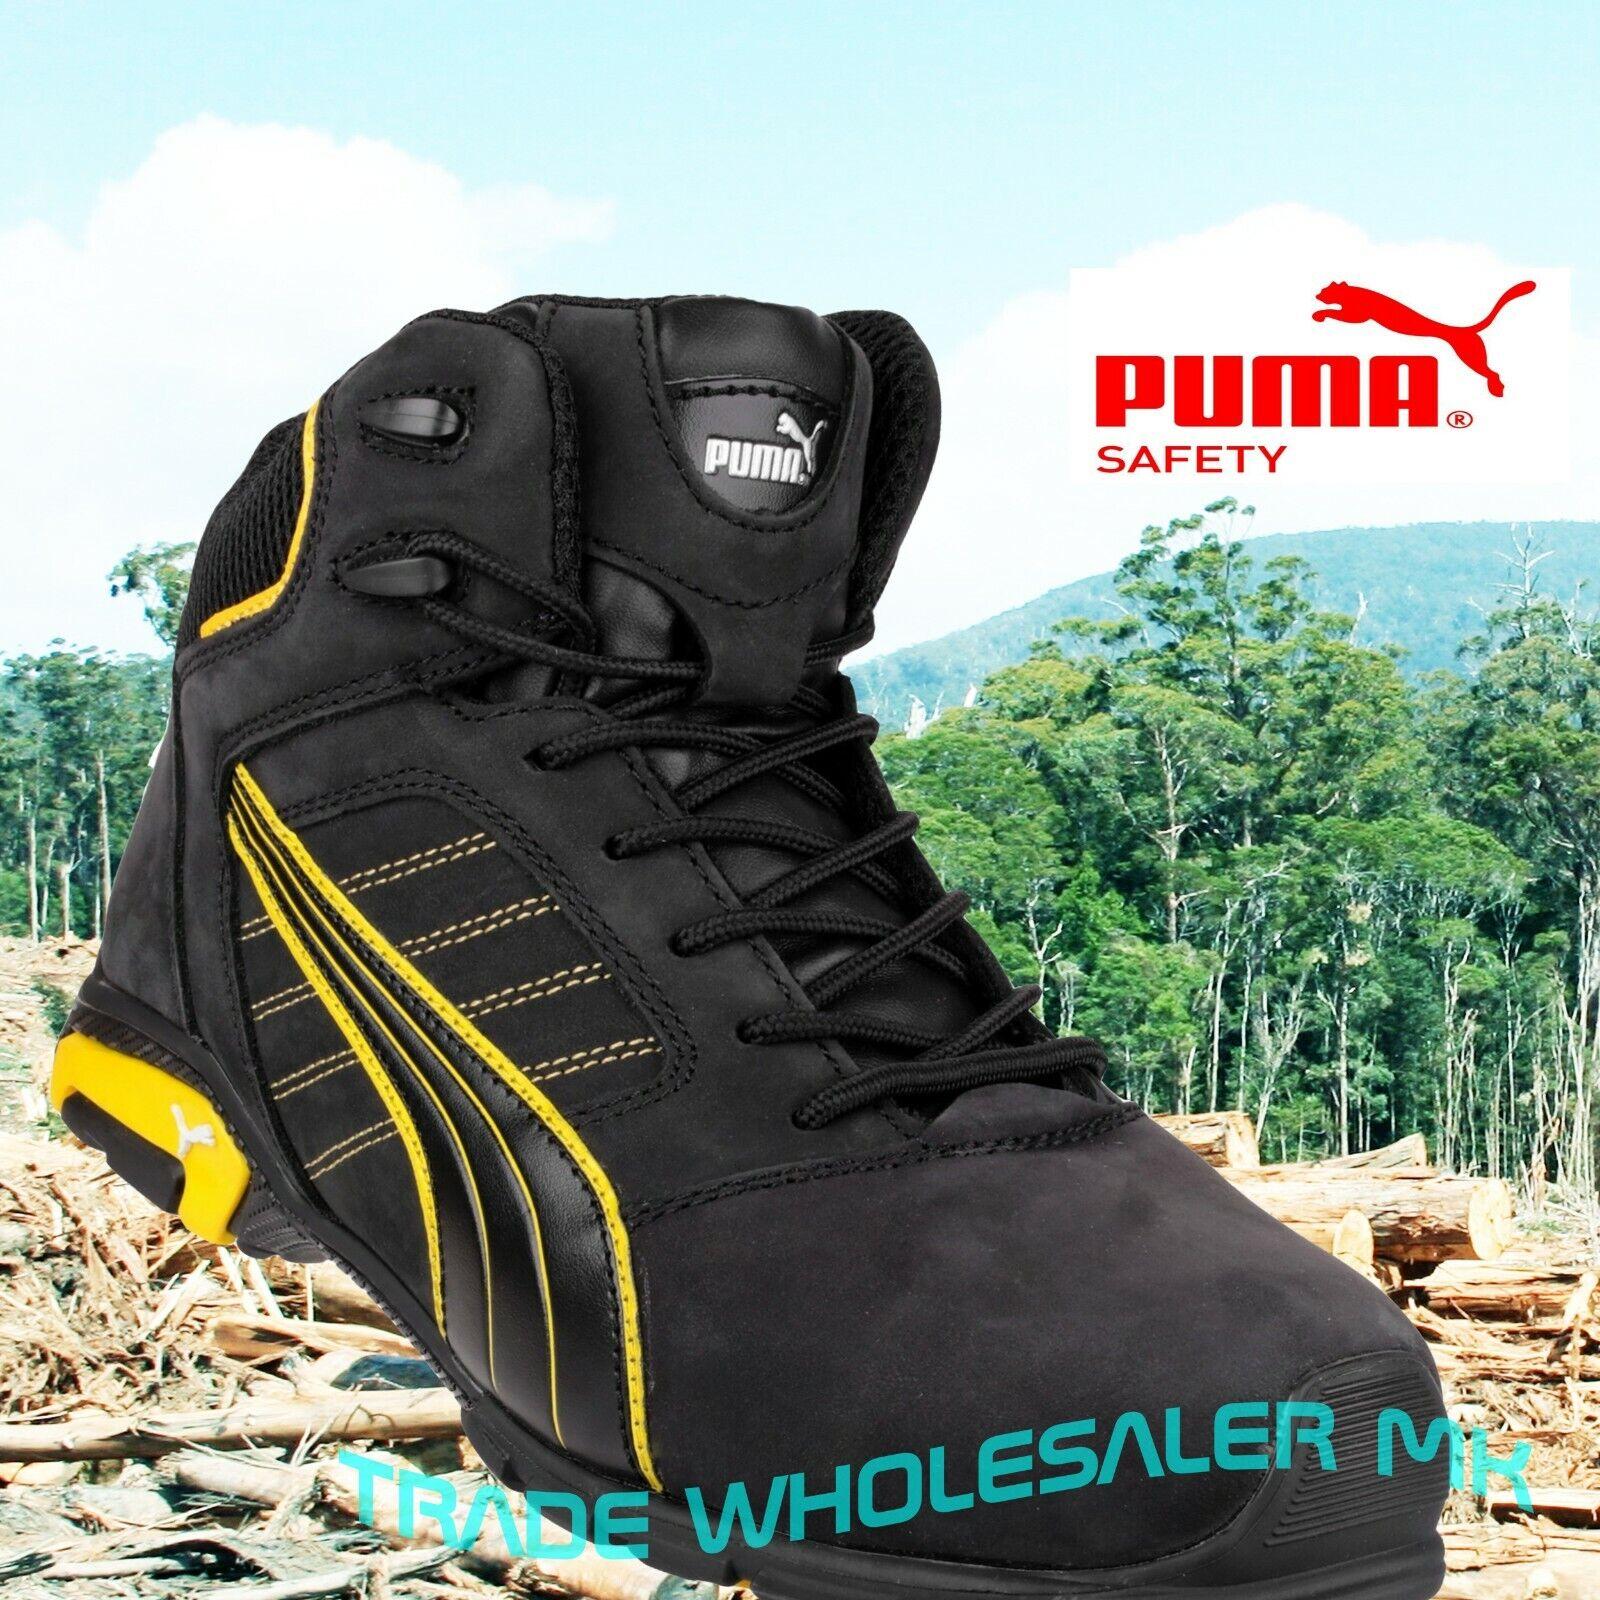 Puma Amsterdam Industrial Mens S3 SRC Safety Midsole & Toe Cap Trainers